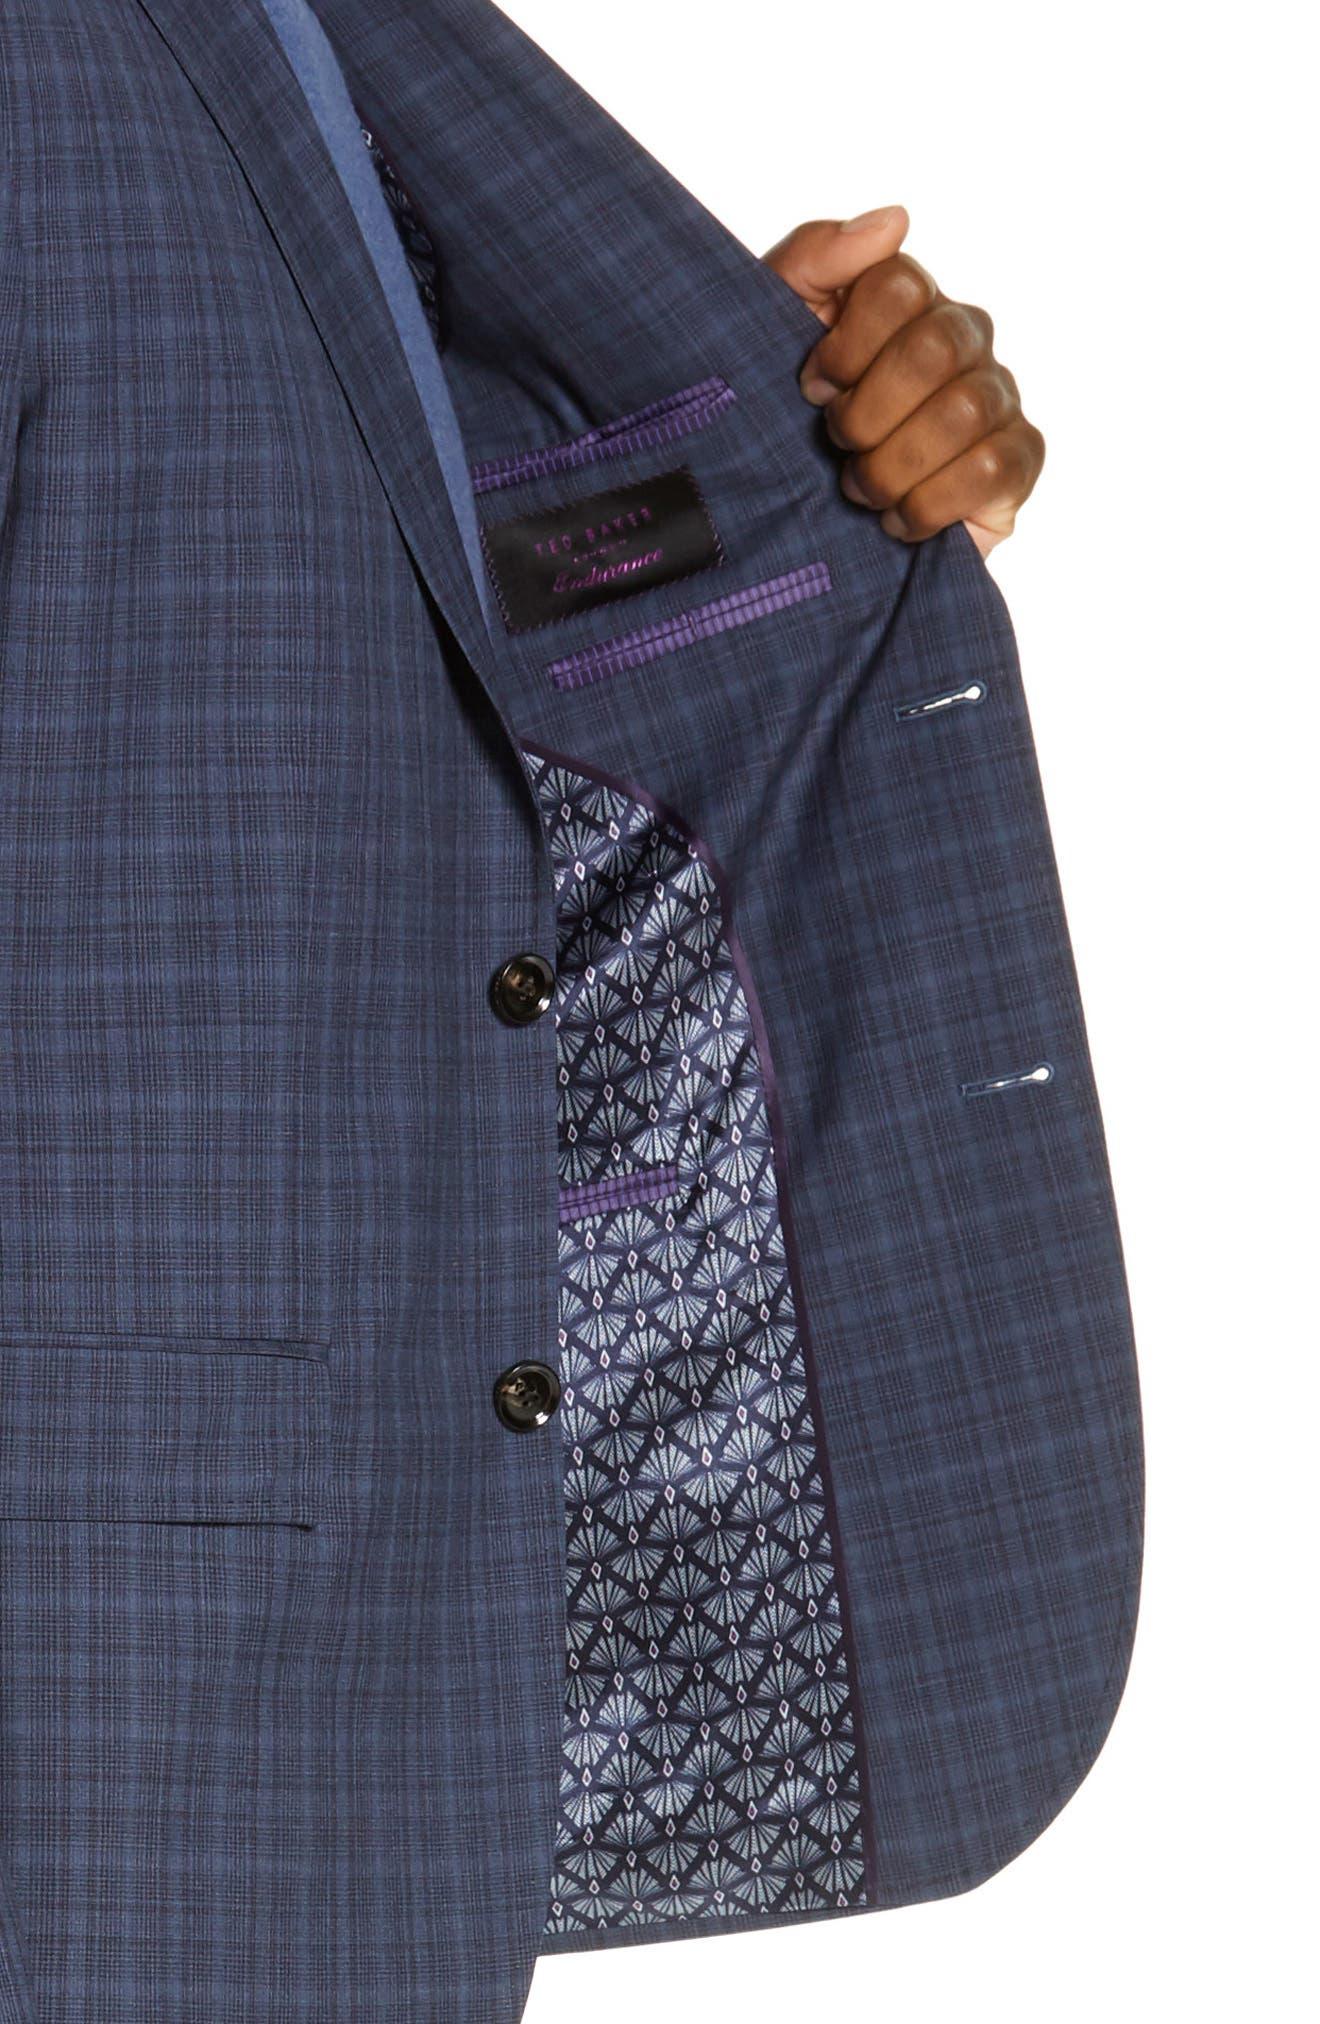 TED BAKER LONDON,                             Roger Slim Fit Plaid Wool Suit,                             Alternate thumbnail 4, color,                             GREY